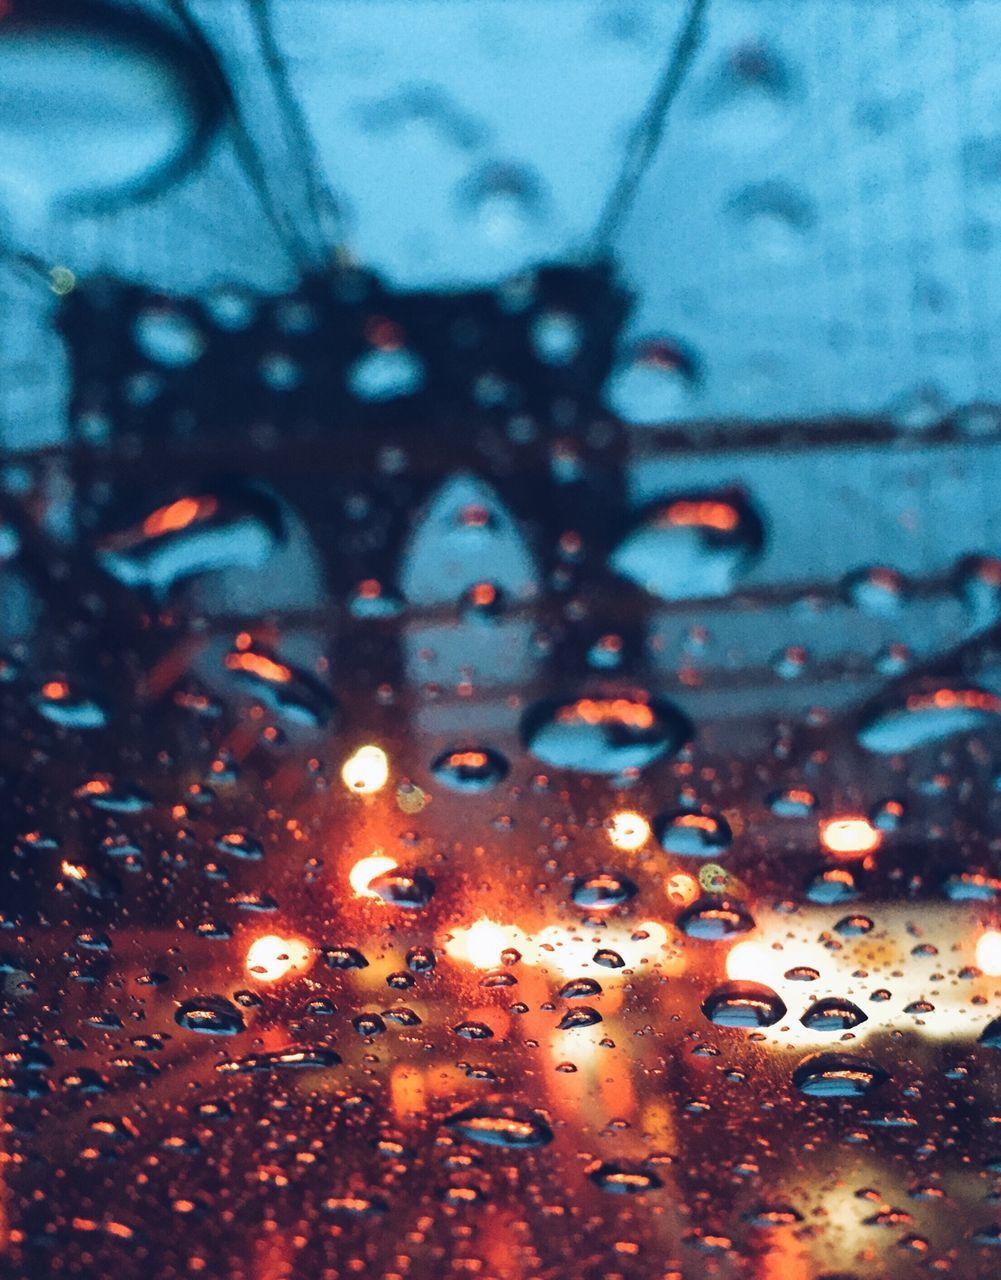 Brooklyn Bridge Seen Through Wet Glass Window